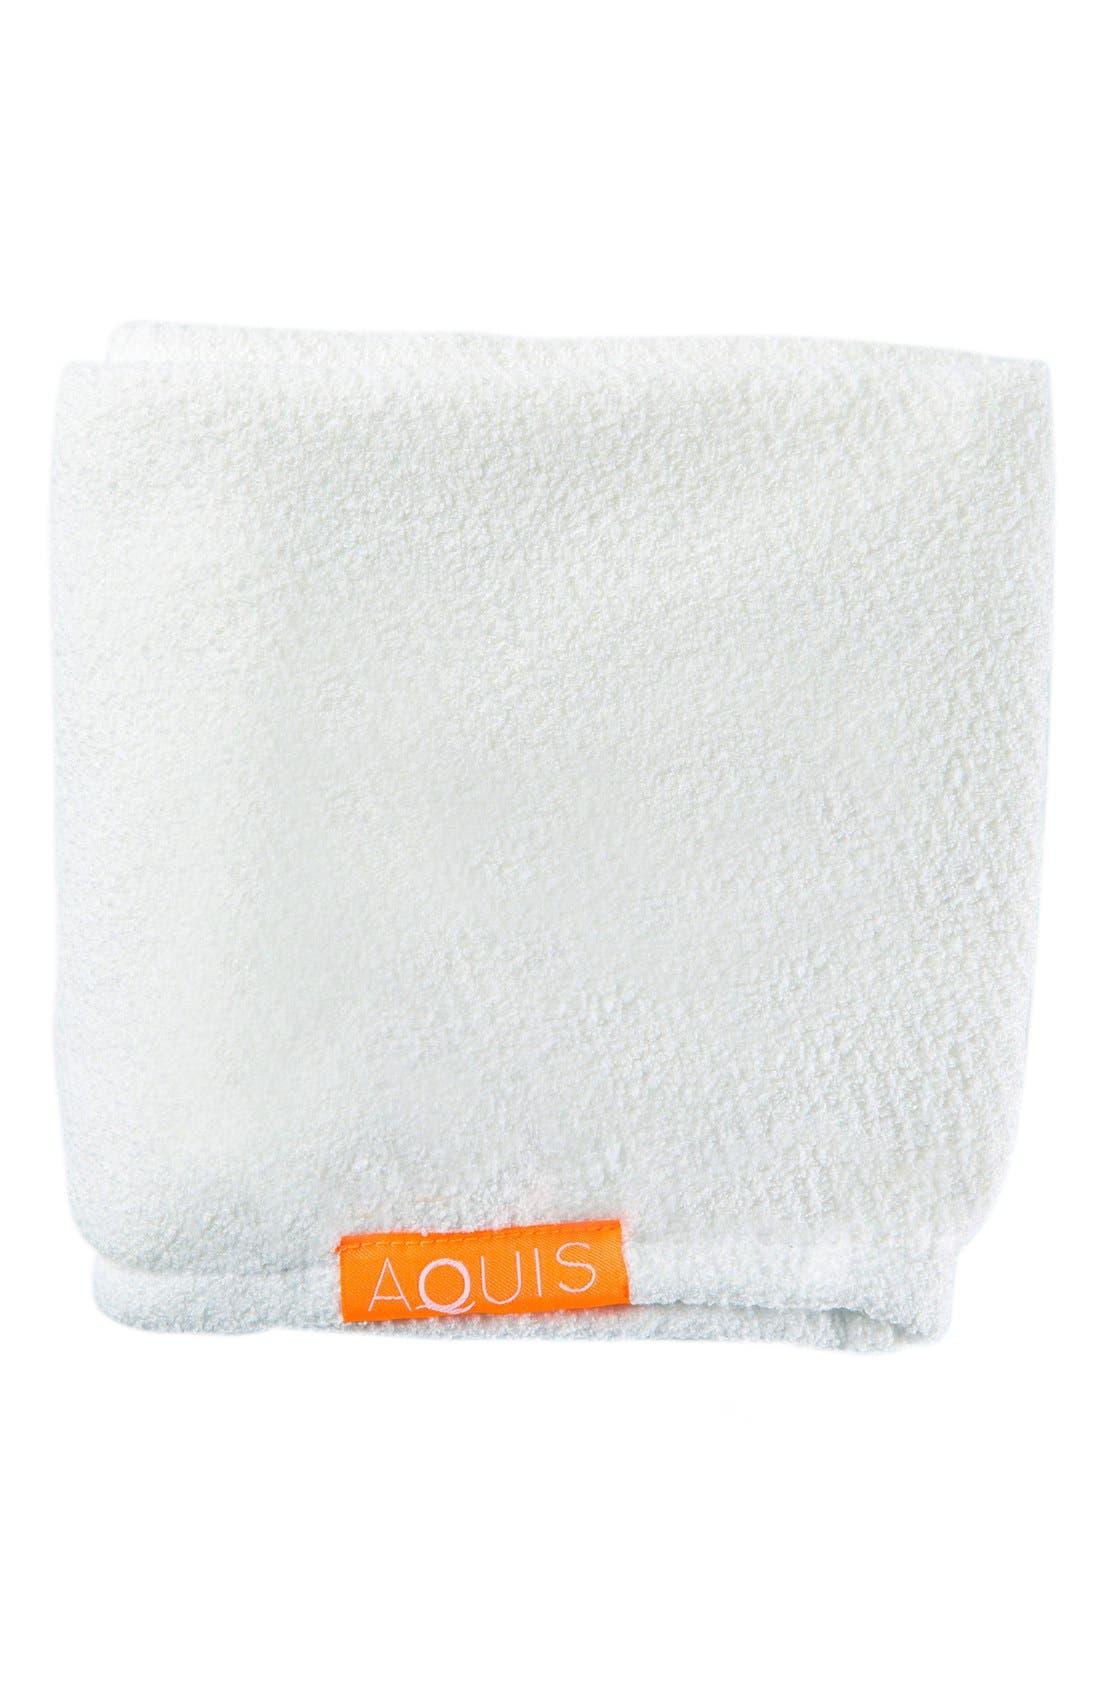 Lisse Luxe White Hair Turban,                             Alternate thumbnail 4, color,